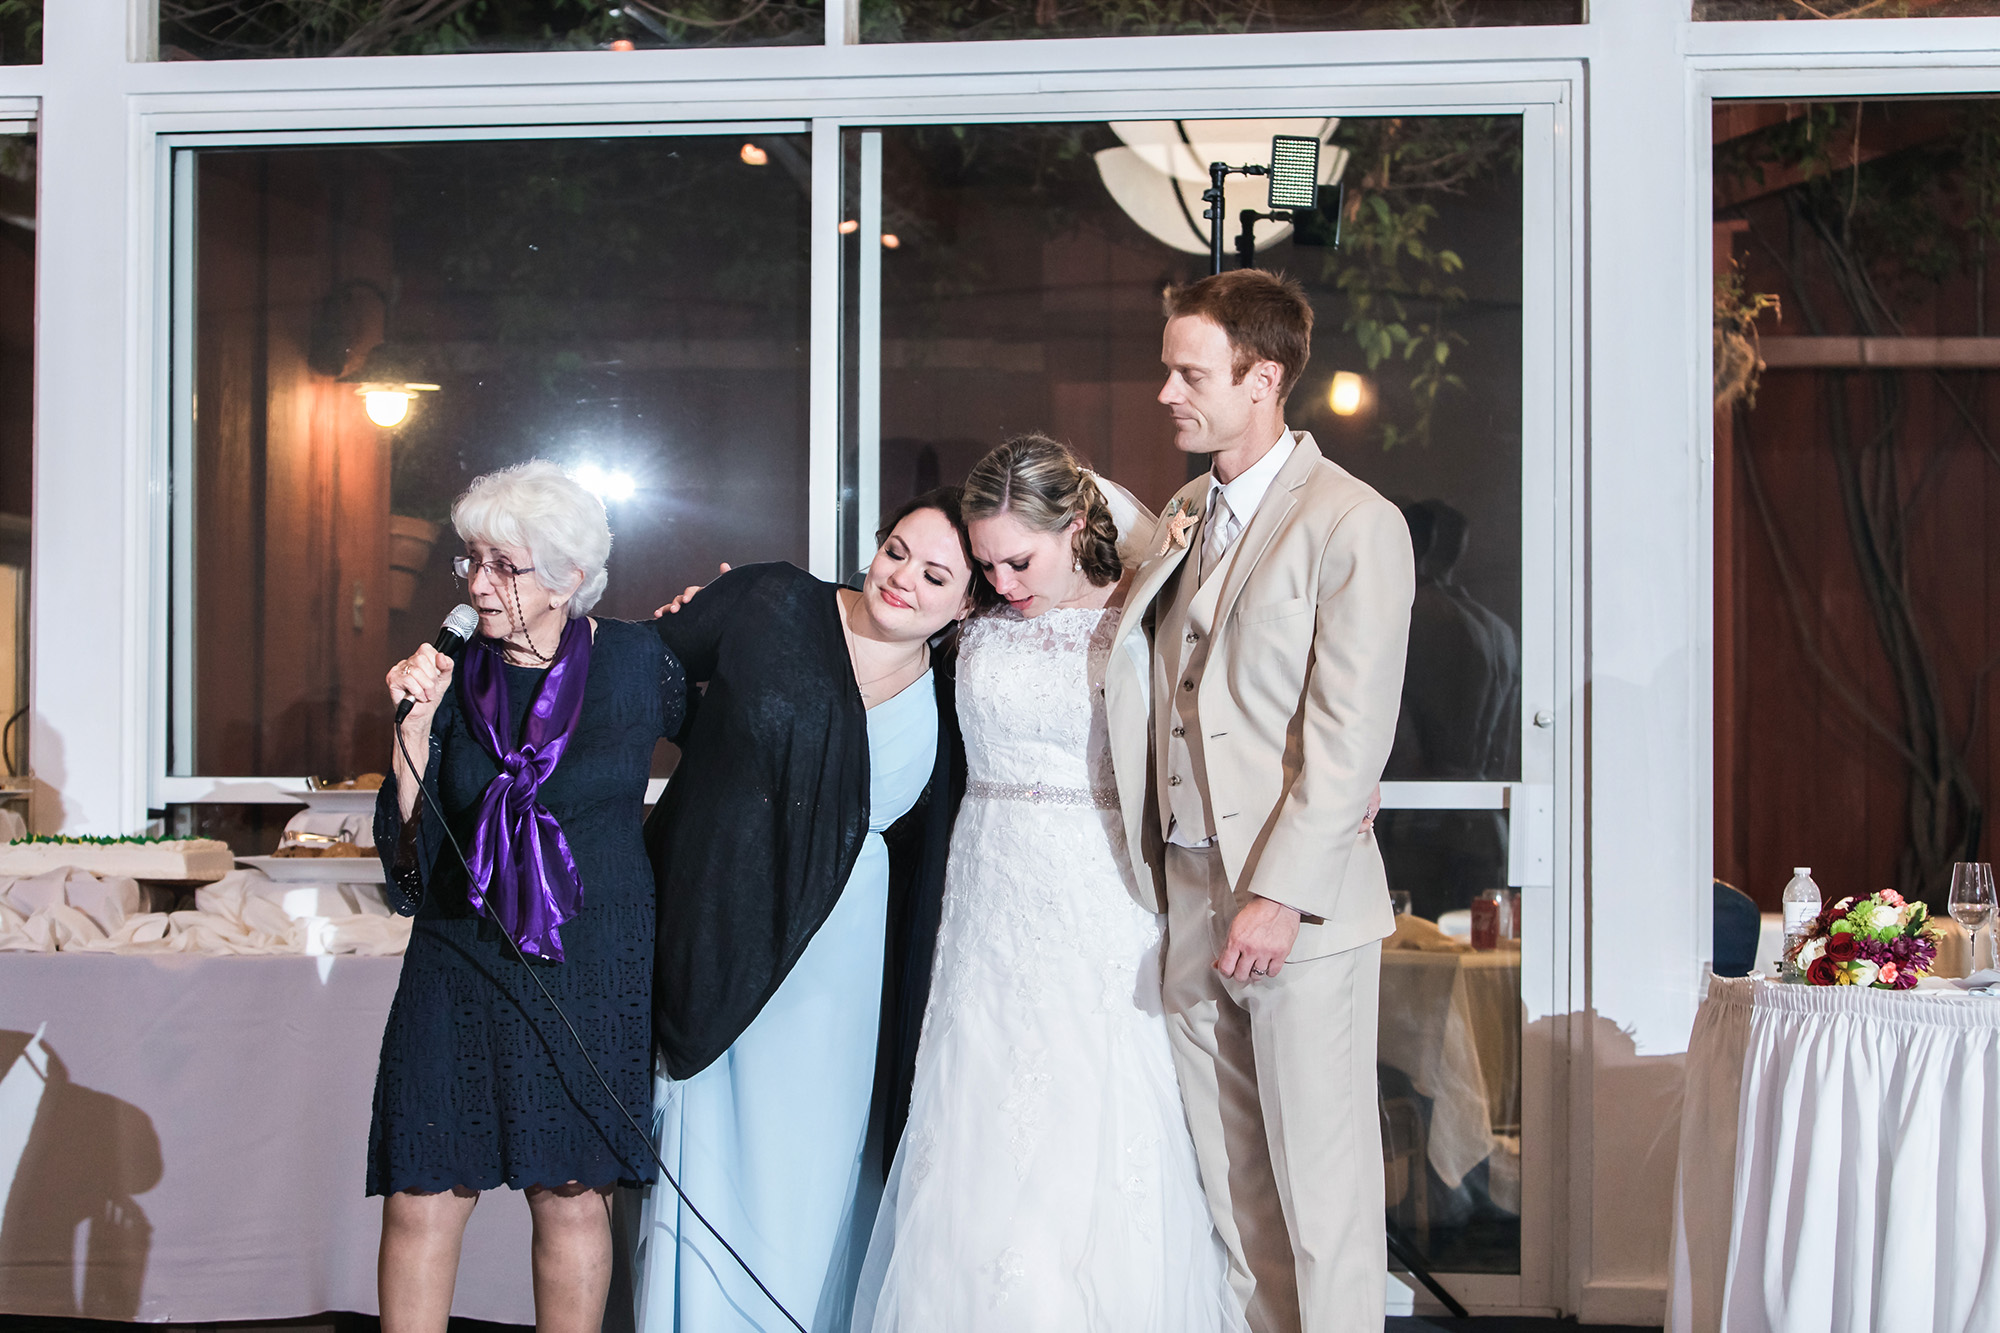 unforgettable-st-monica-wedding-carrie-vines-photography-116.jpg